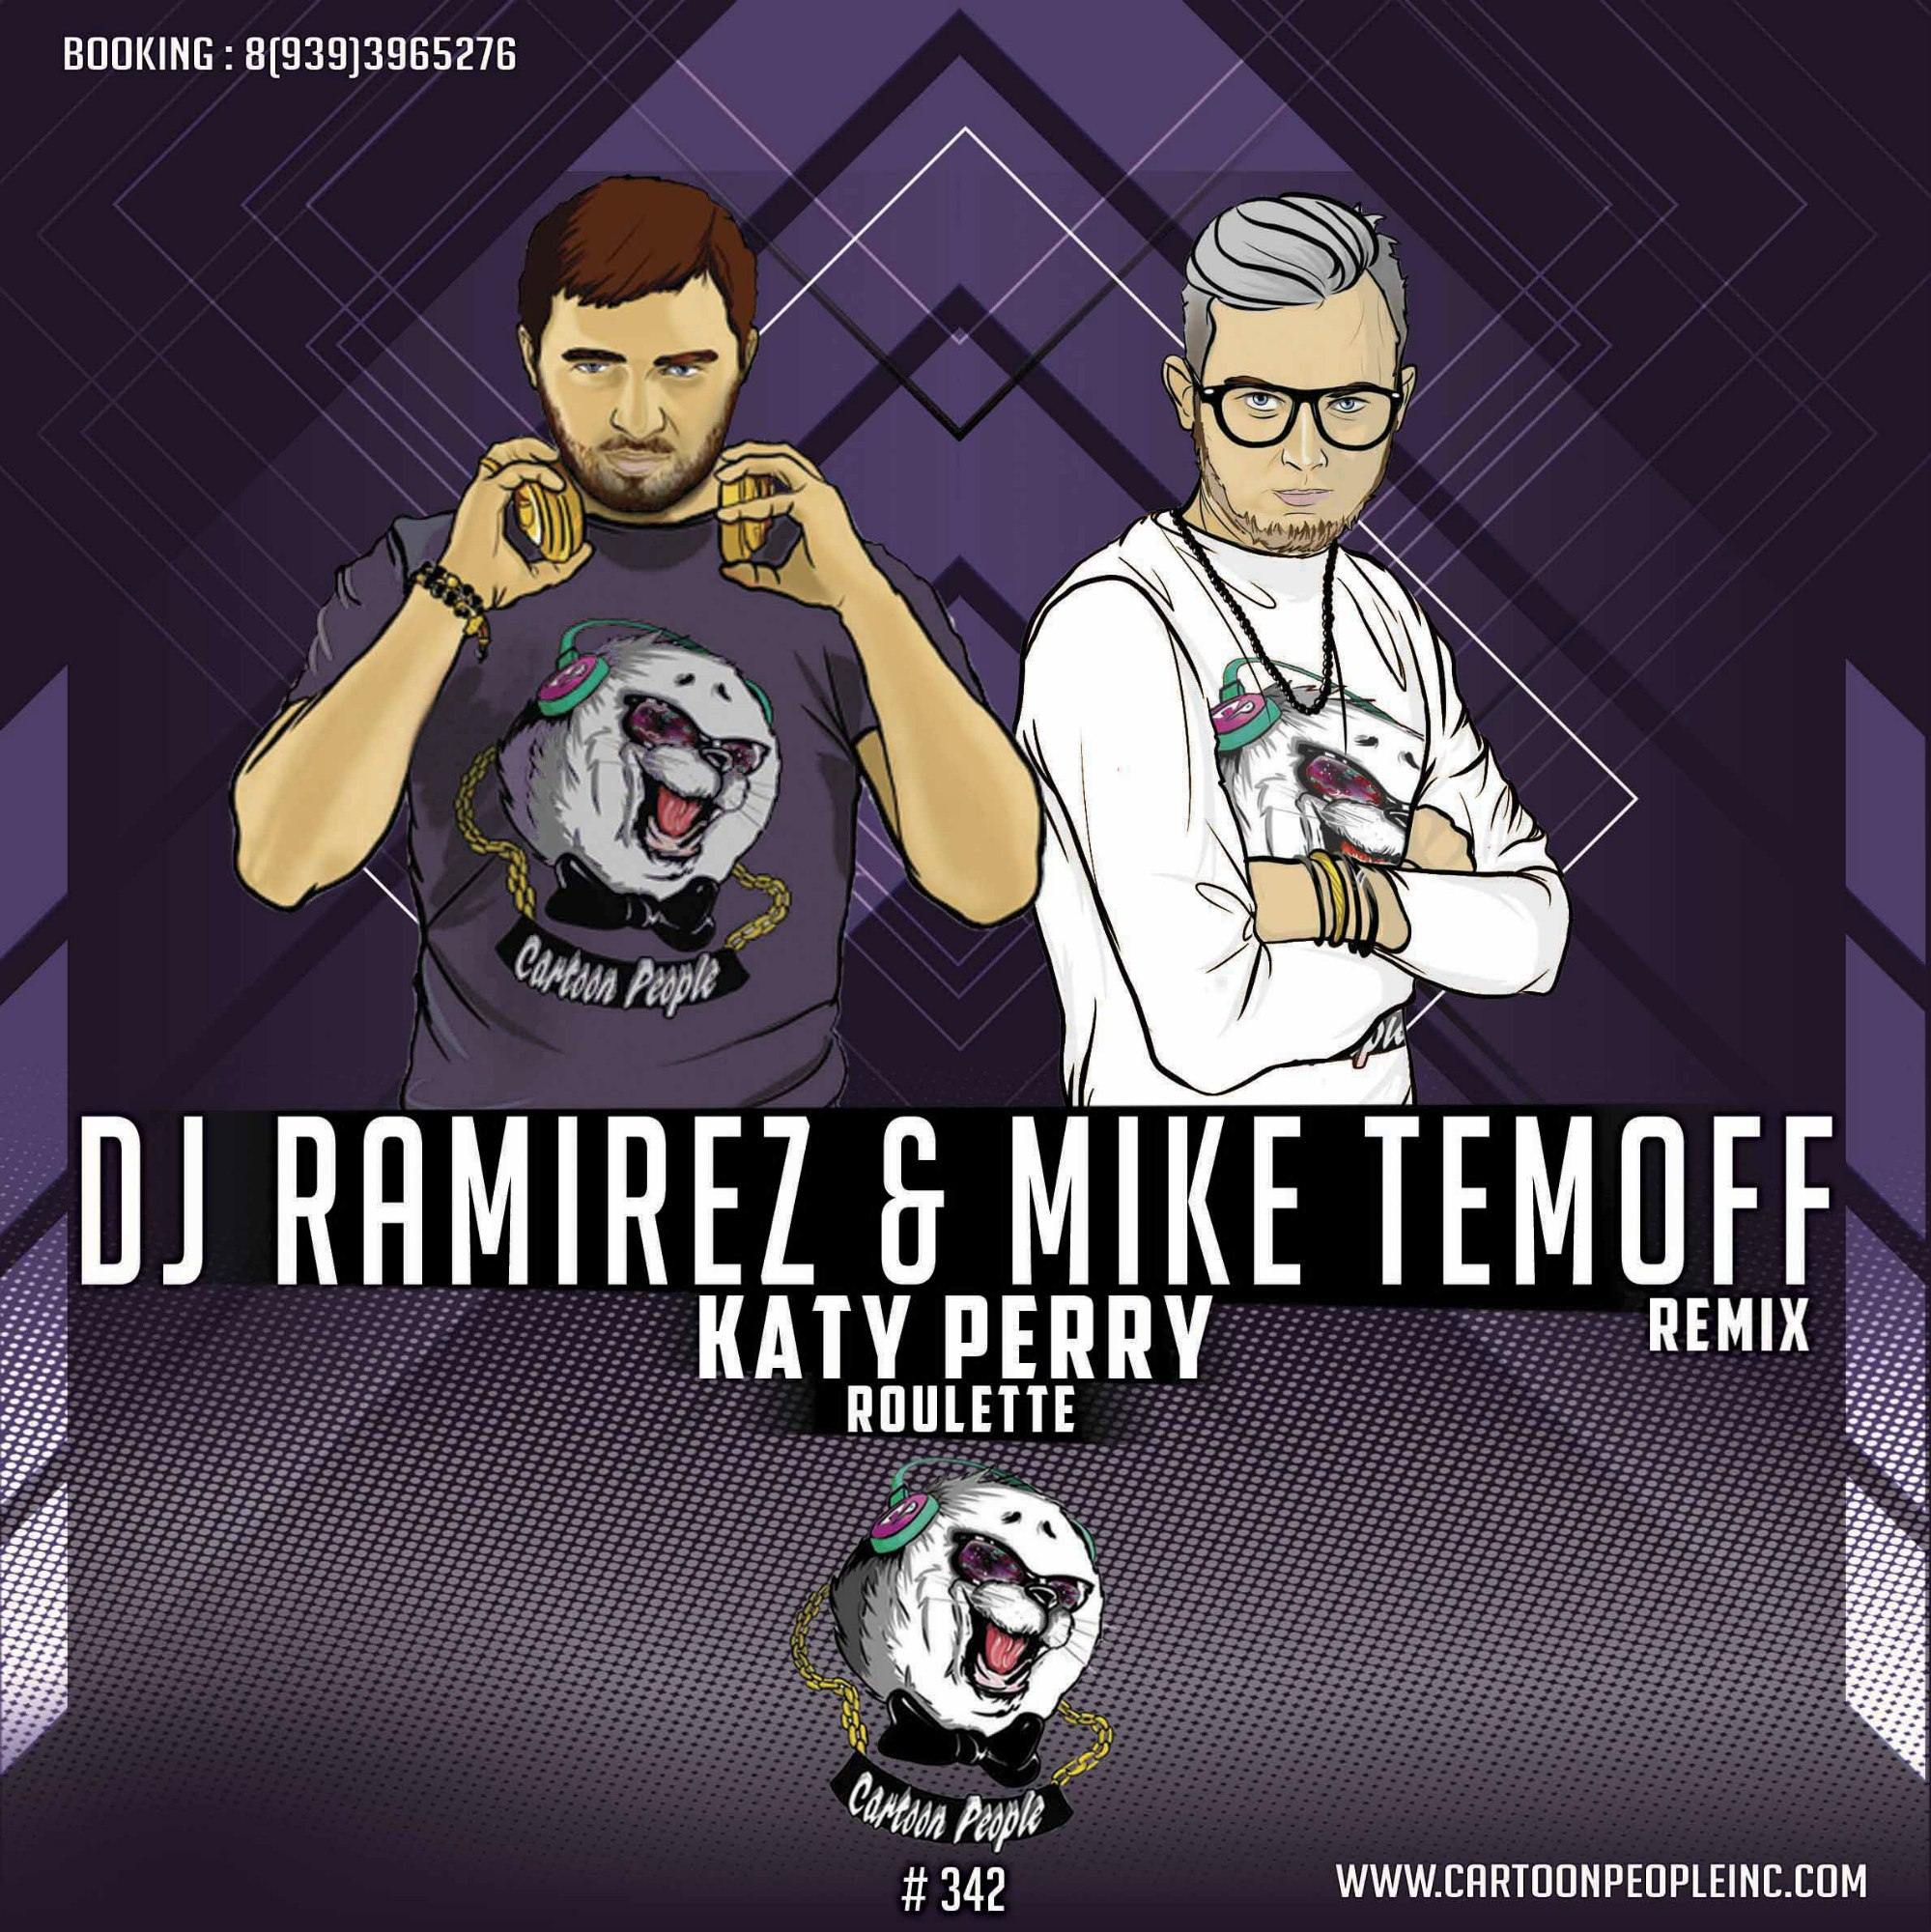 Katy Perry - Roulette (DJ Ramirez & Mike Temoff Radio Remix) (Original Mix)